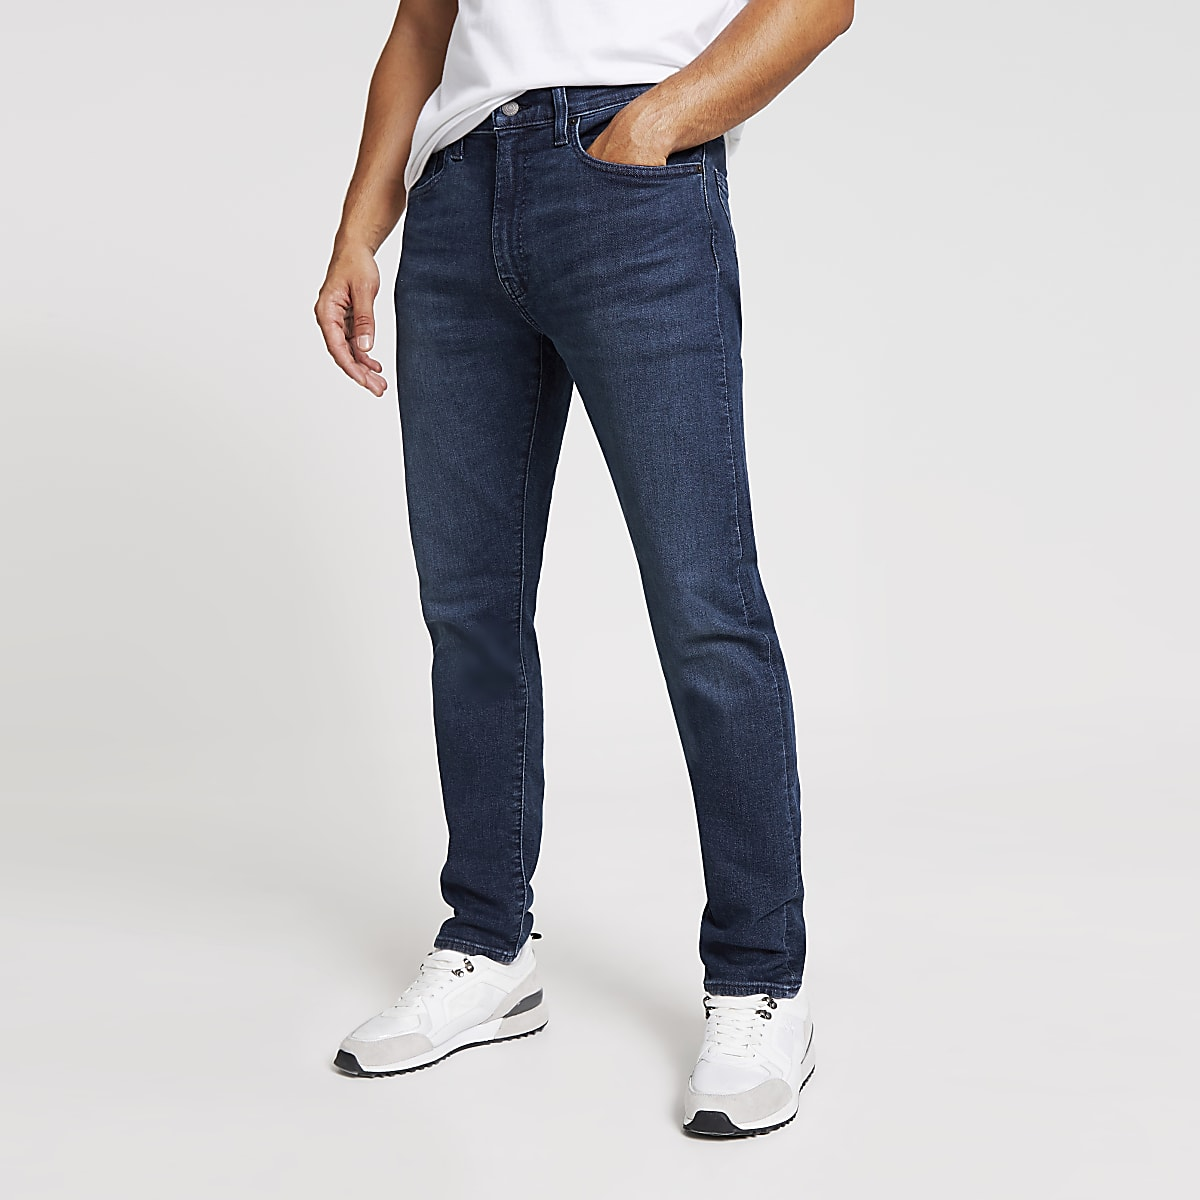 Levi's dark blue 512 slim fit denim jeans